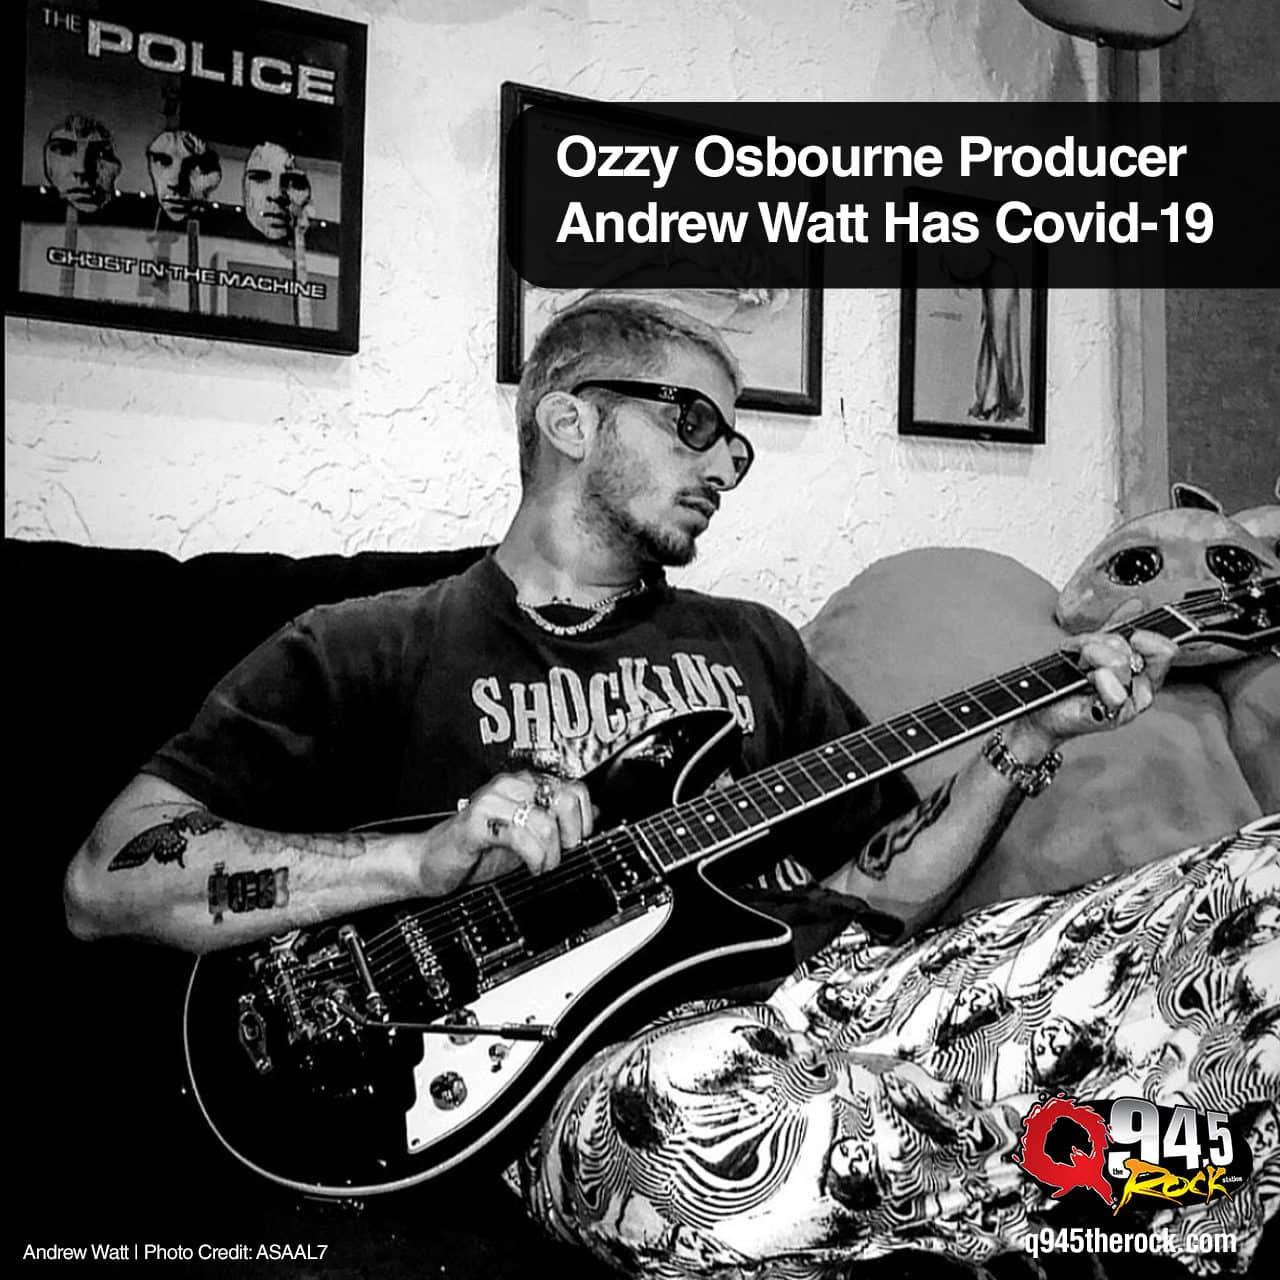 Ozzy Osbourne Producer Andrew Watt Has Covid-19